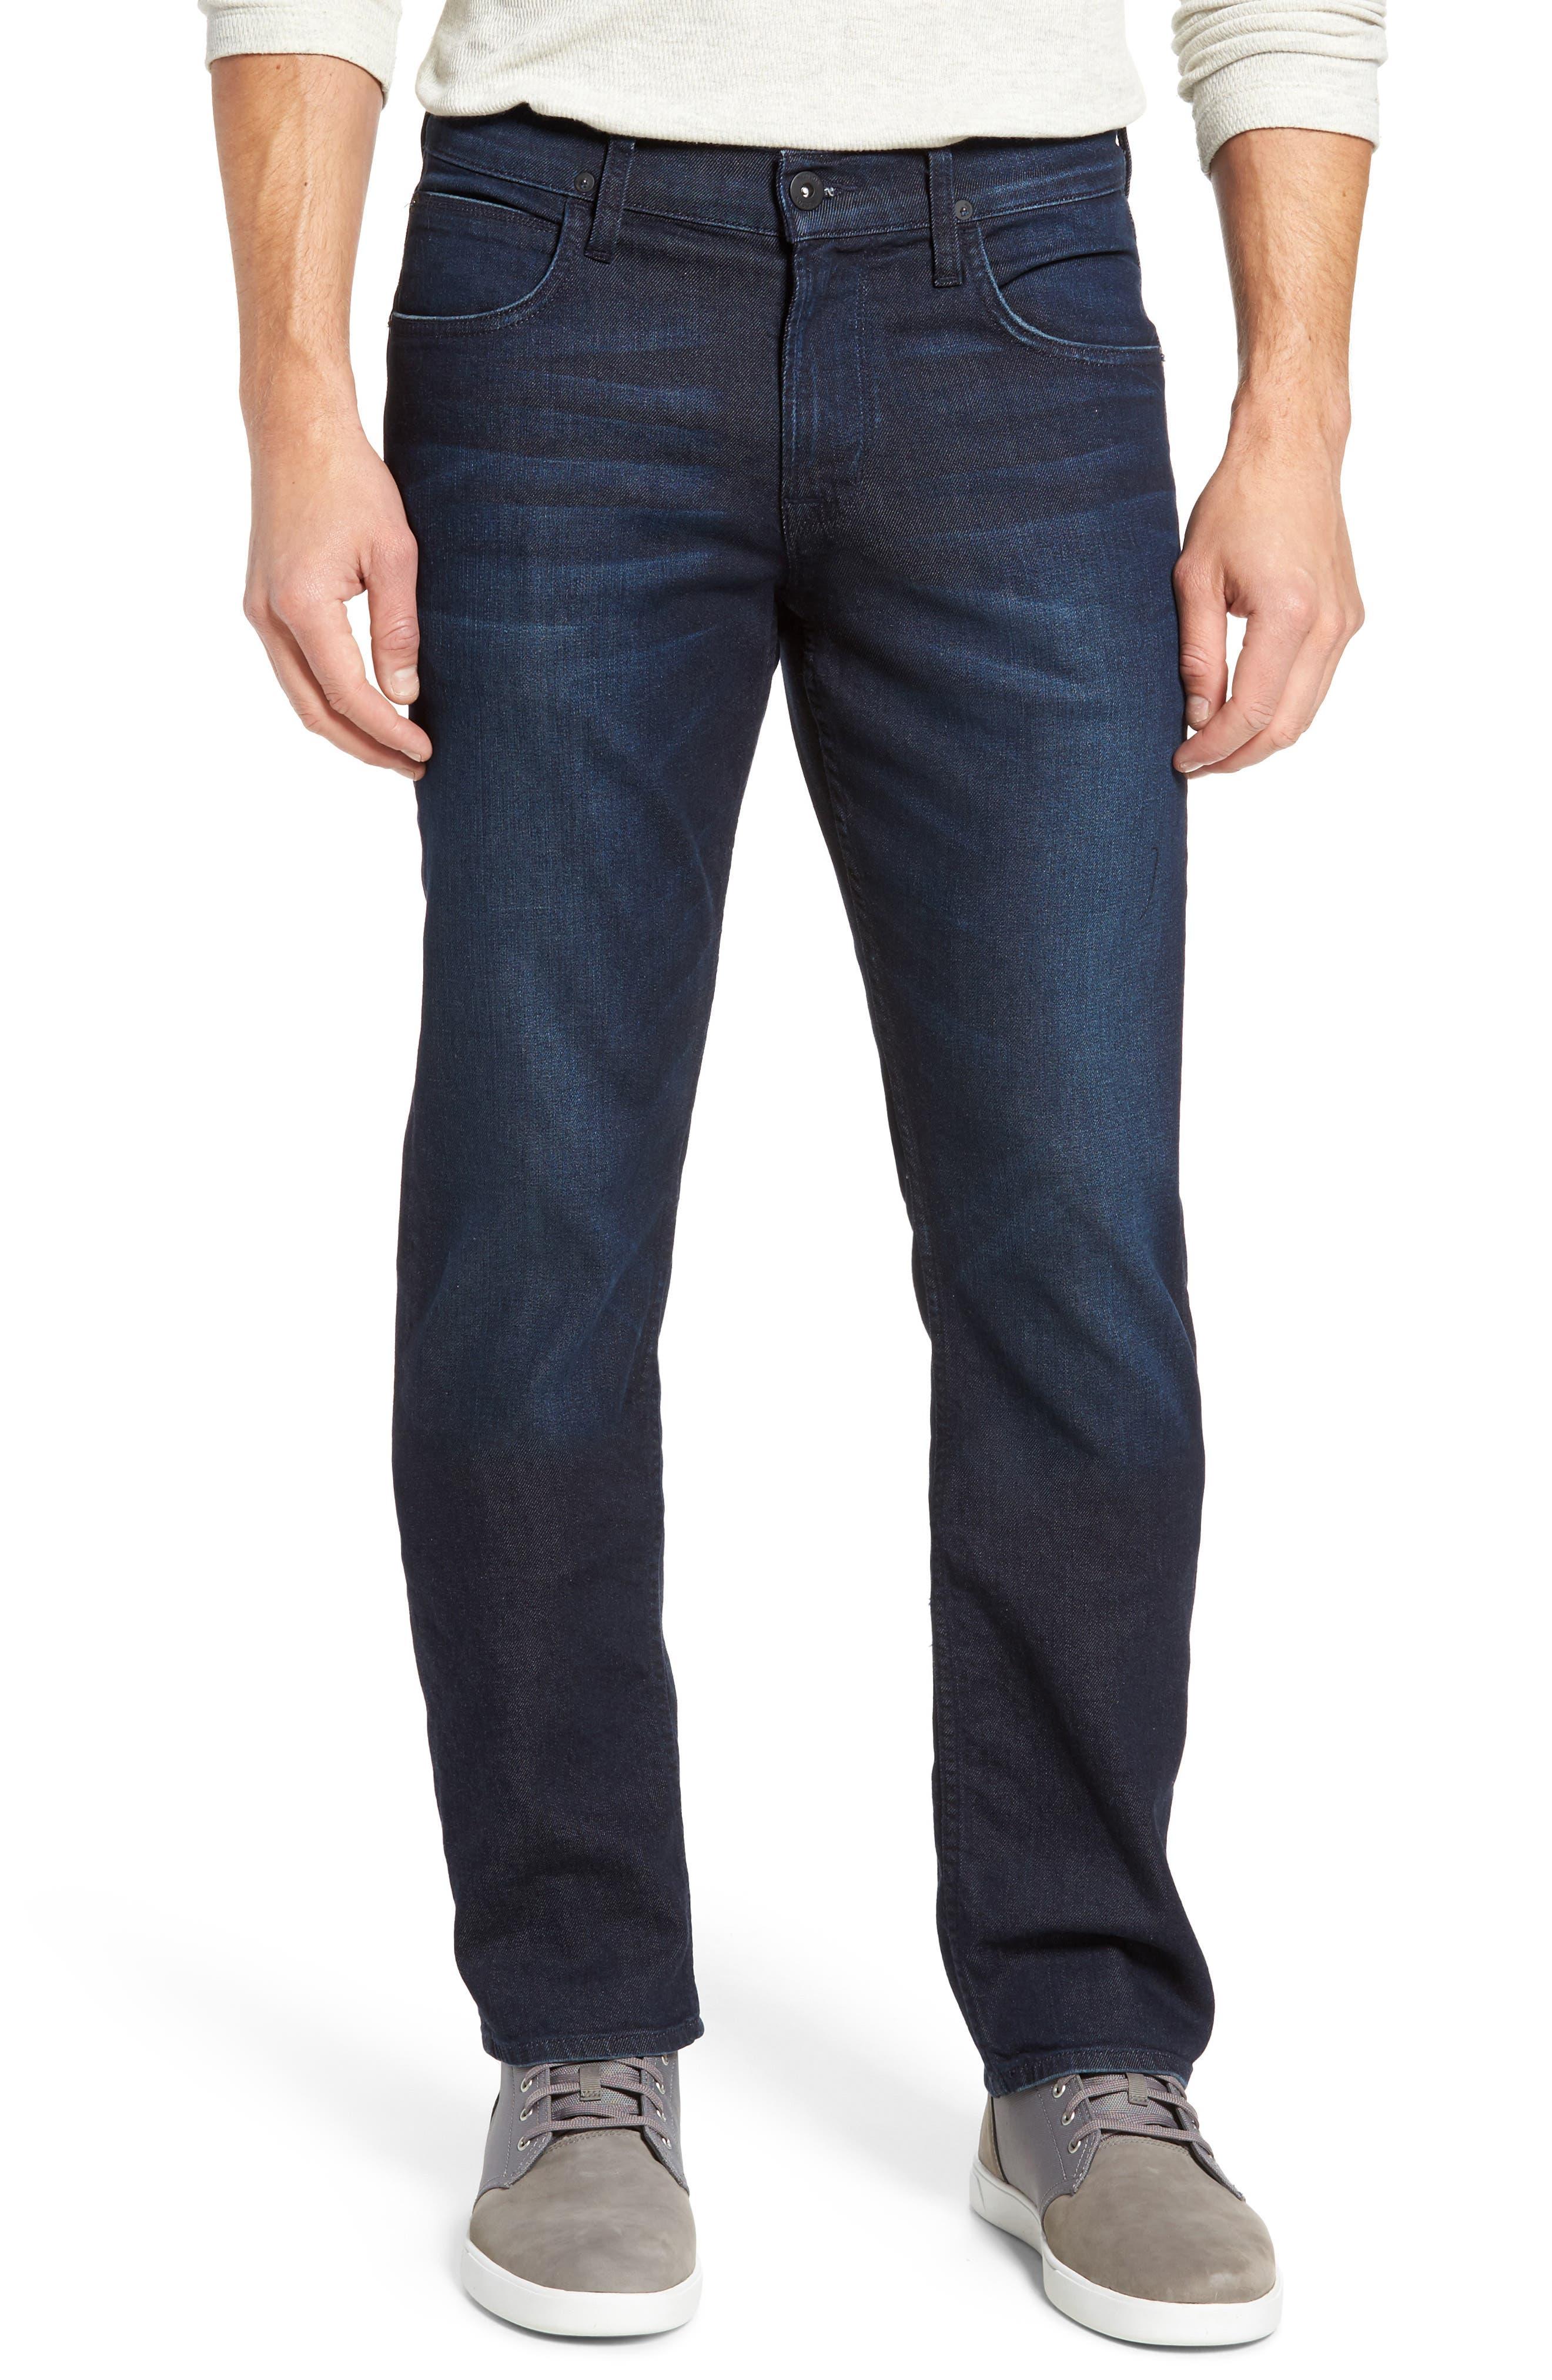 Alternate Image 1 Selected - Hudson Jeans Byron Slim Straight Leg Jeans (Viral)